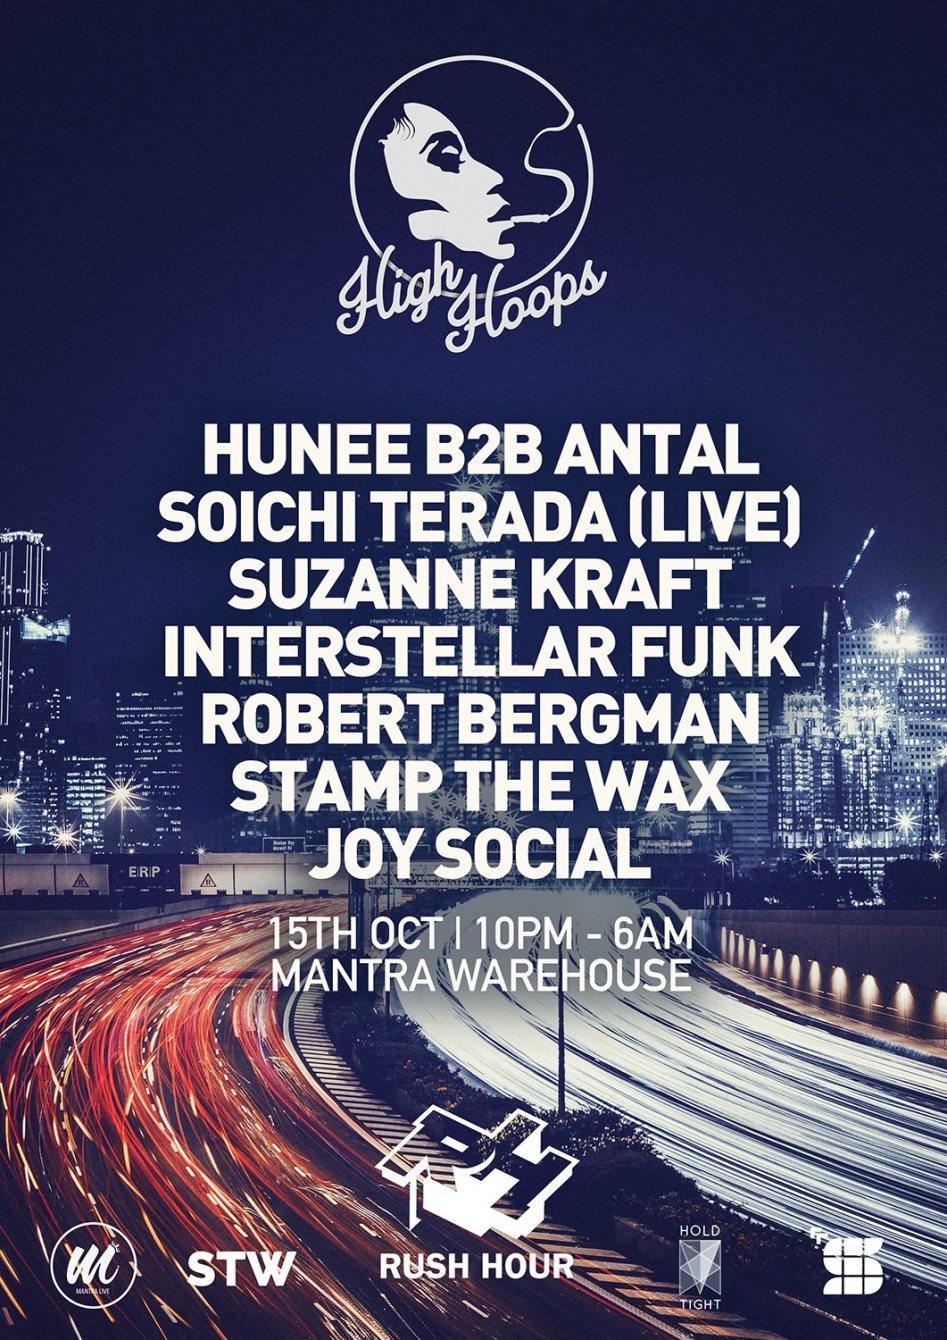 High Hoops x Rush Hour - Hunee, Antal, Soichi Terada, Suzanne Kraft, Interstellar Funk - Flyer front